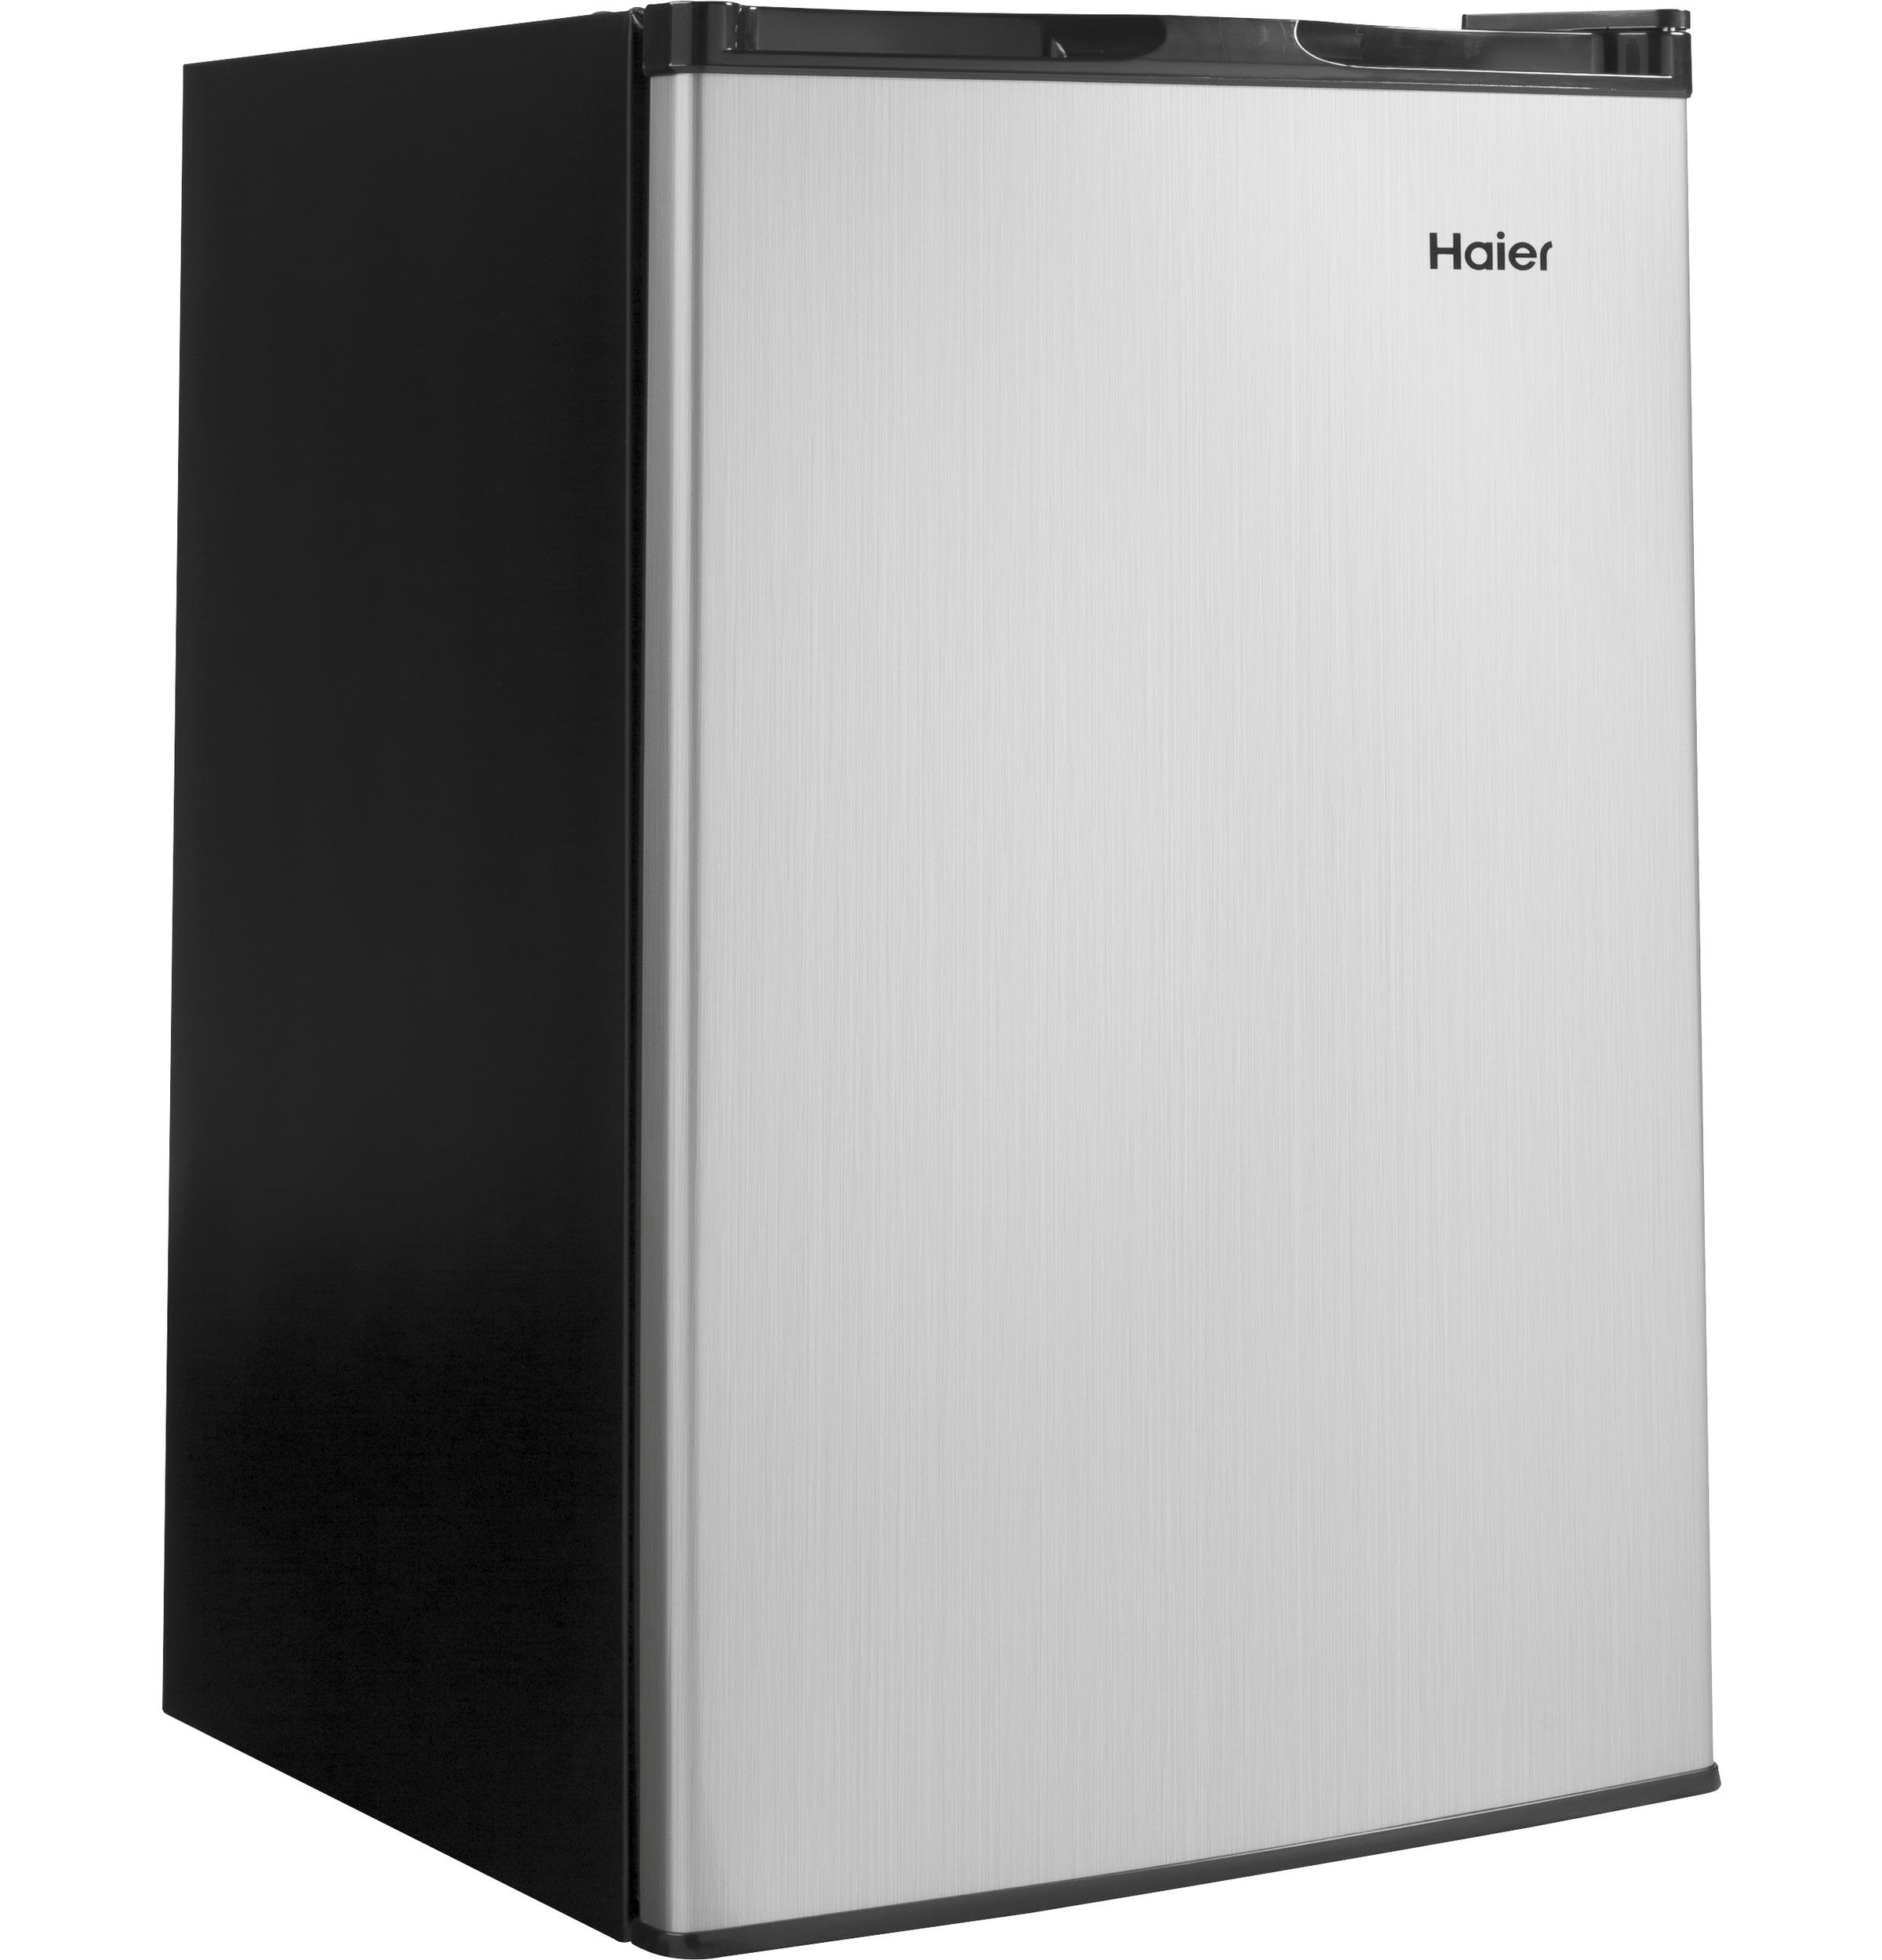 Model: HC46SF10SV   4.5 Cu. Ft. Compact Refrigerator